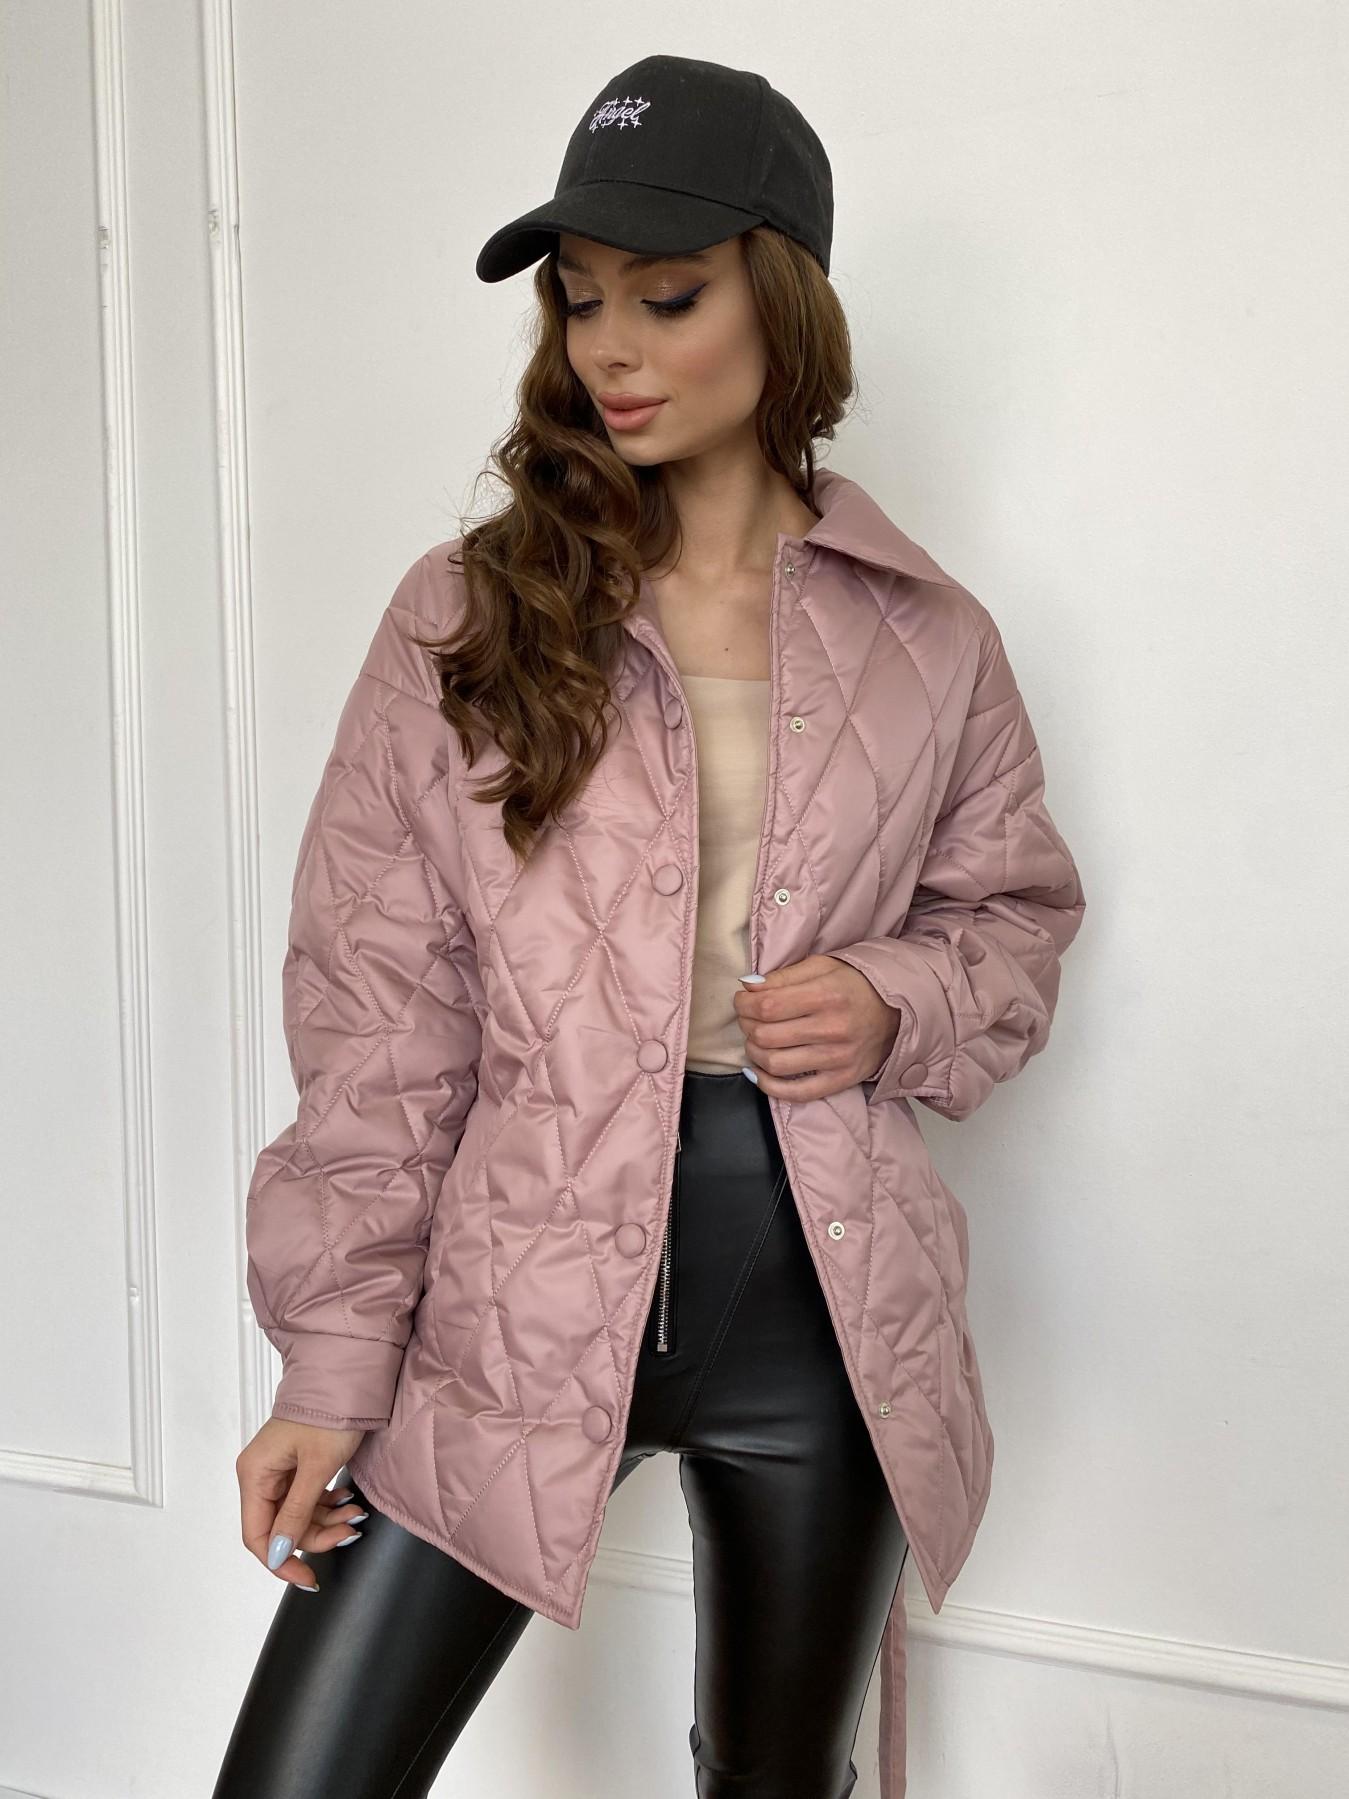 Моно  куртка из плащевой ткани Gloria 11081 АРТ. 47647 Цвет: Пудра - фото 14, интернет магазин tm-modus.ru